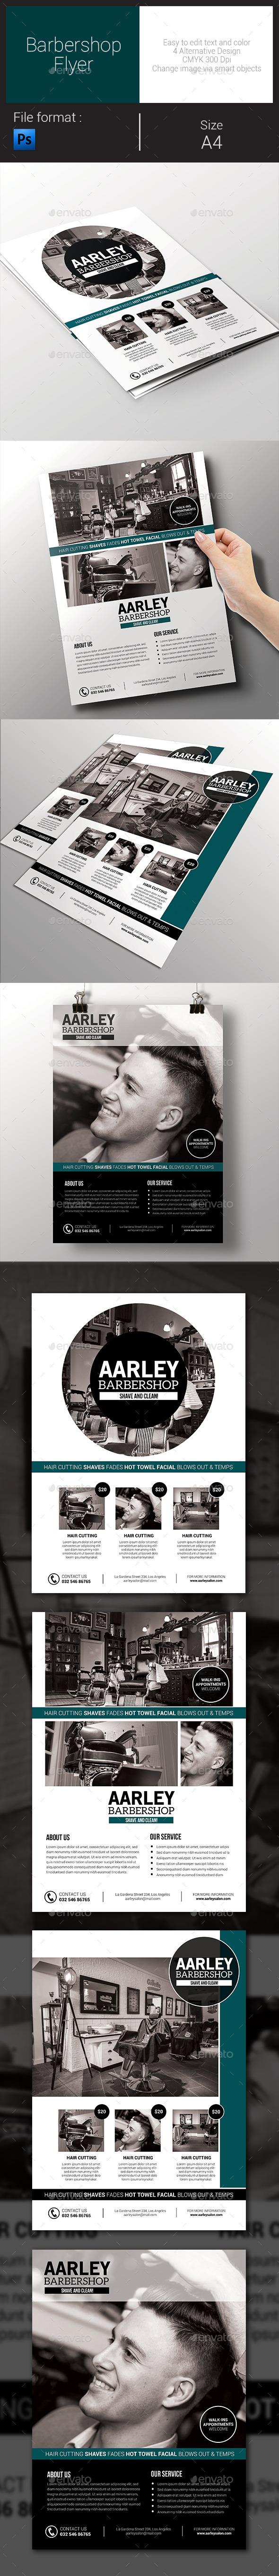 GraphicRiver Simple Barbershop Flyer 9192355